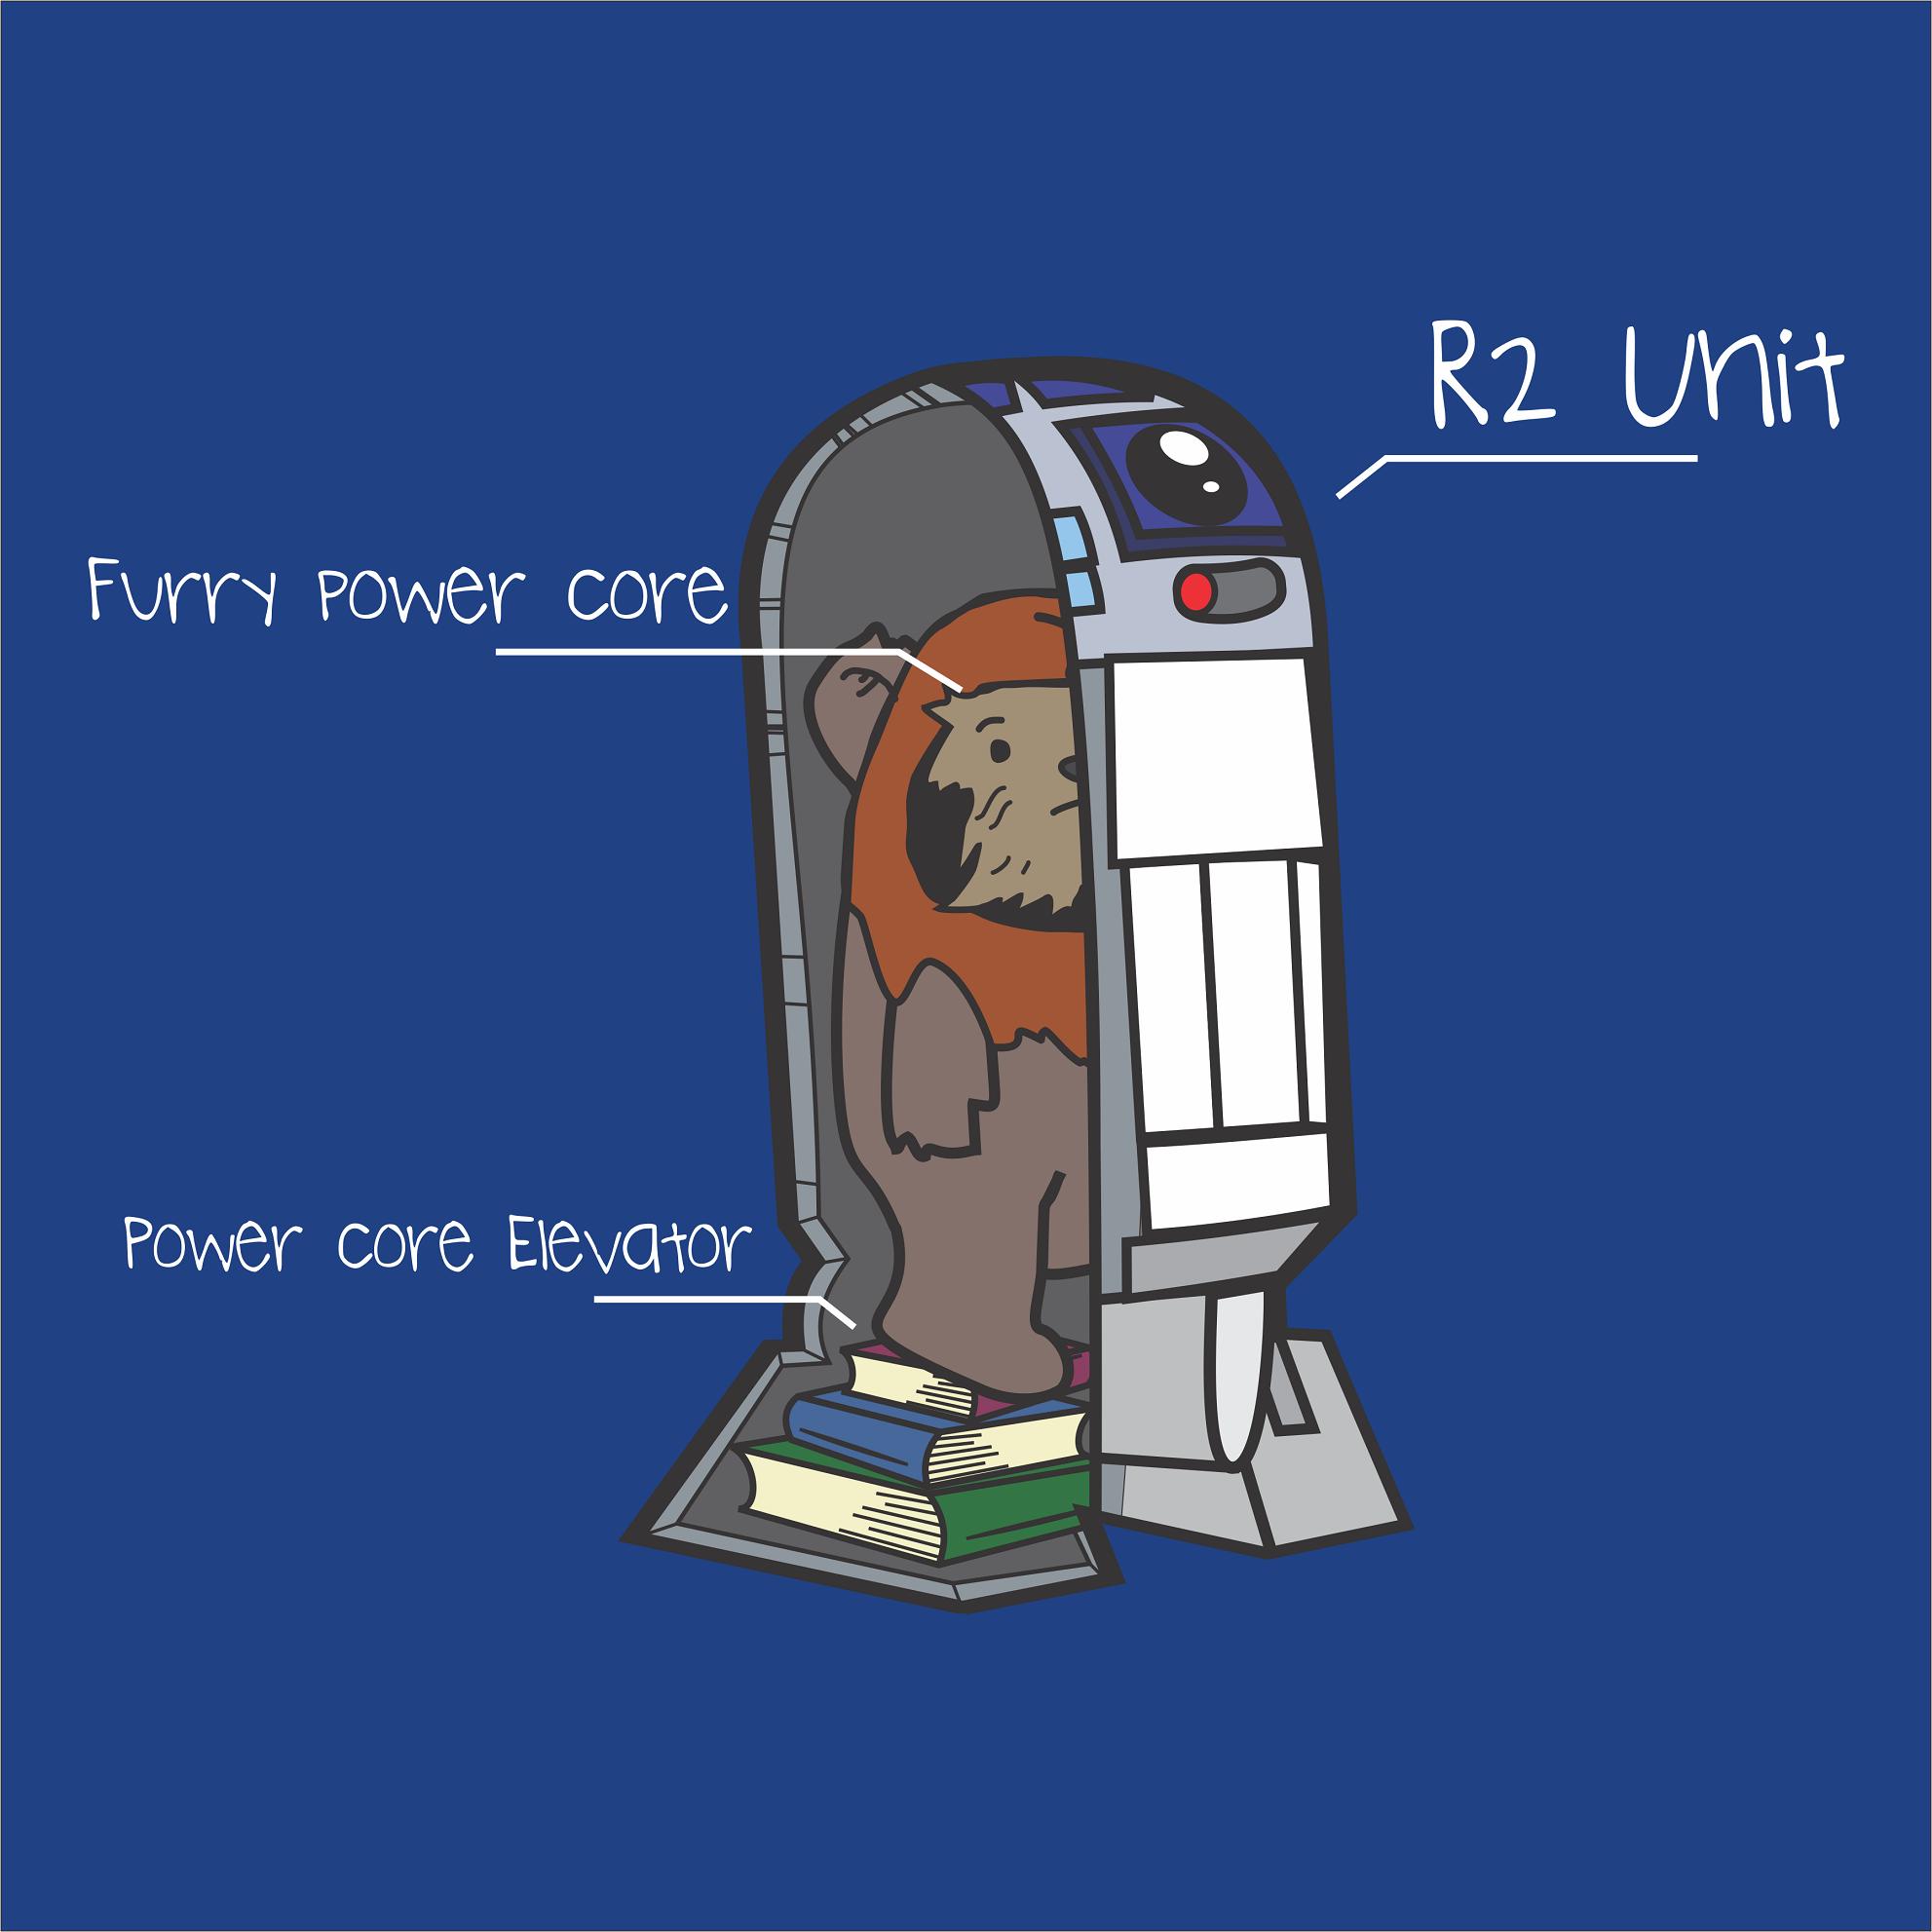 Inside an R2-Unit